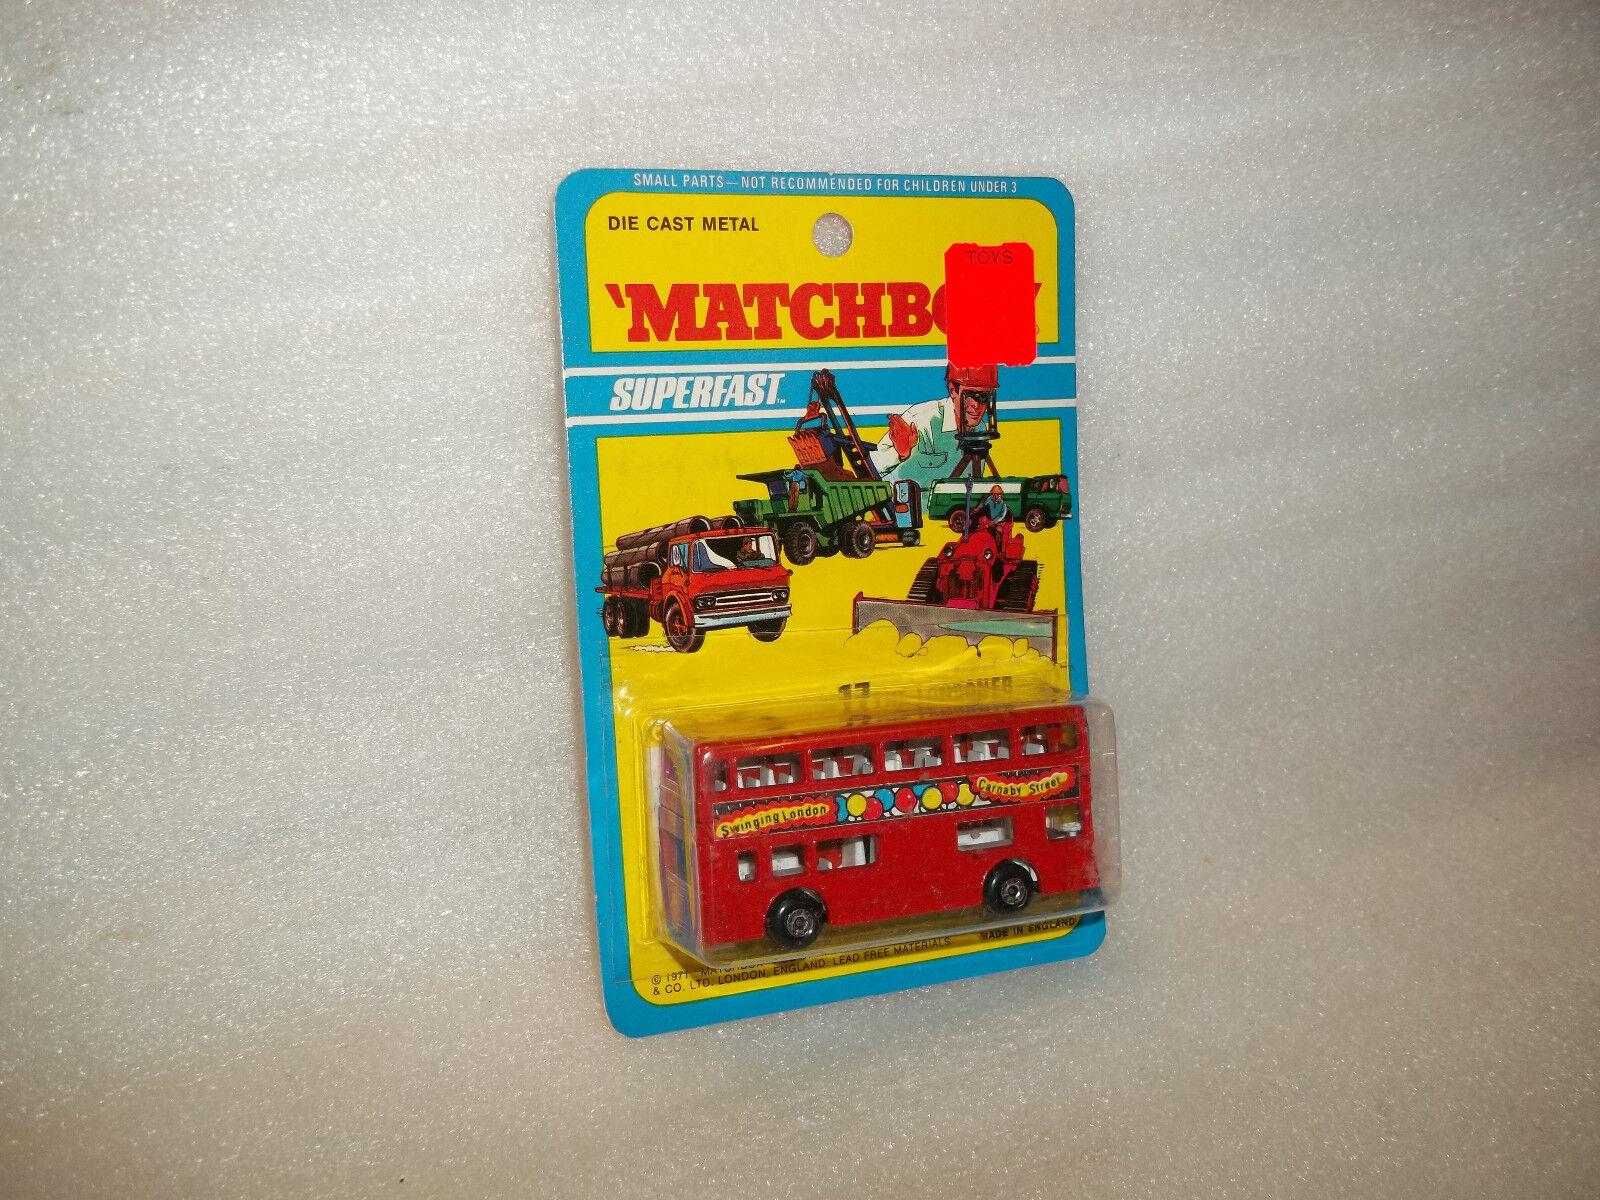 Matchbox Matchbox Matchbox Superfast No. 17 Londoner Swinging Lodon 1971 on Card e639a8